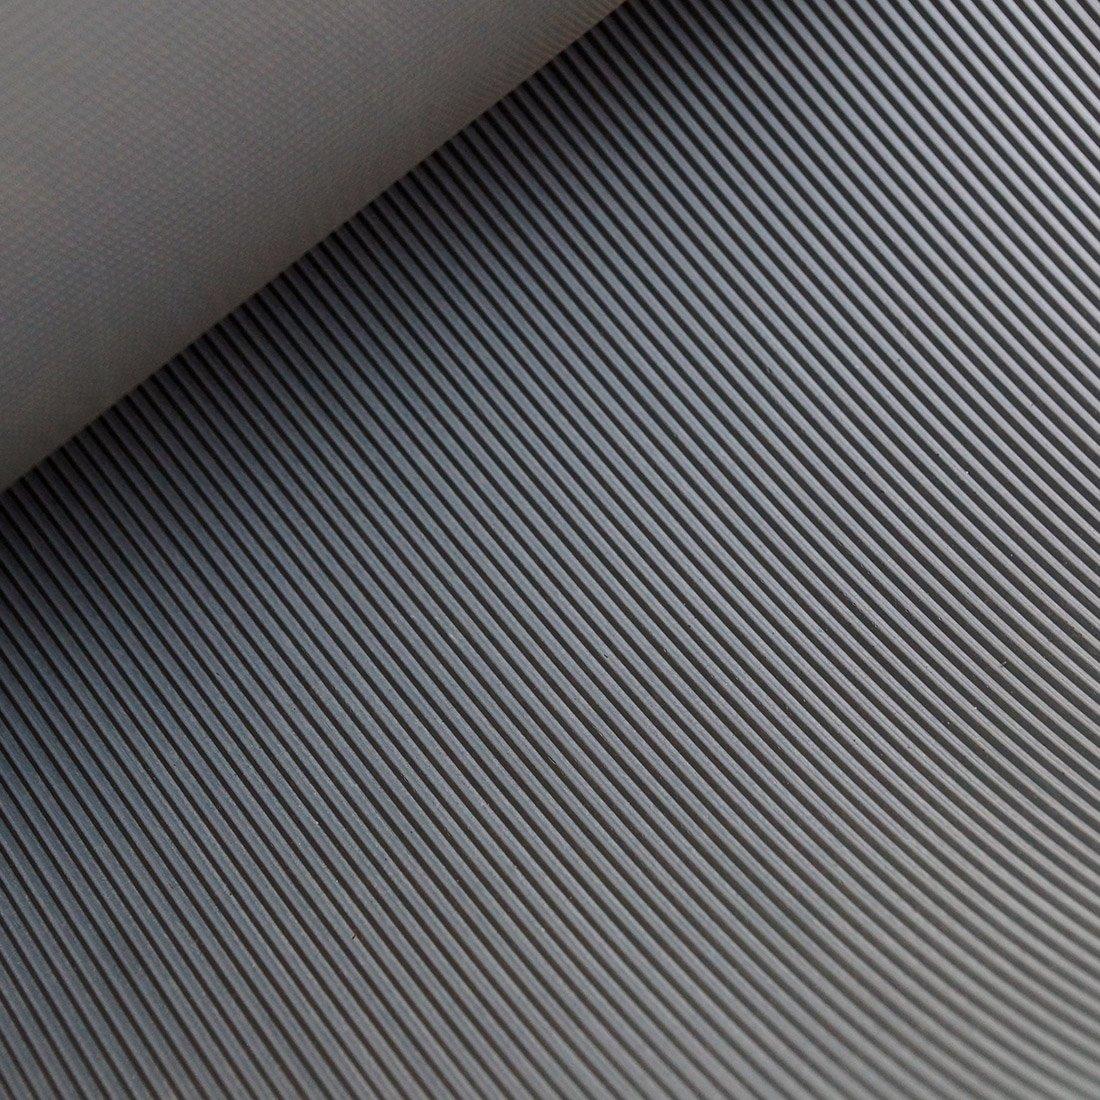 Gr/ö/ße + Farbe w/ählbar 4m/² 1,0 x 4,0m St/ärke: 3mm Farbe: Dunkelgrau Feinriefenmatte